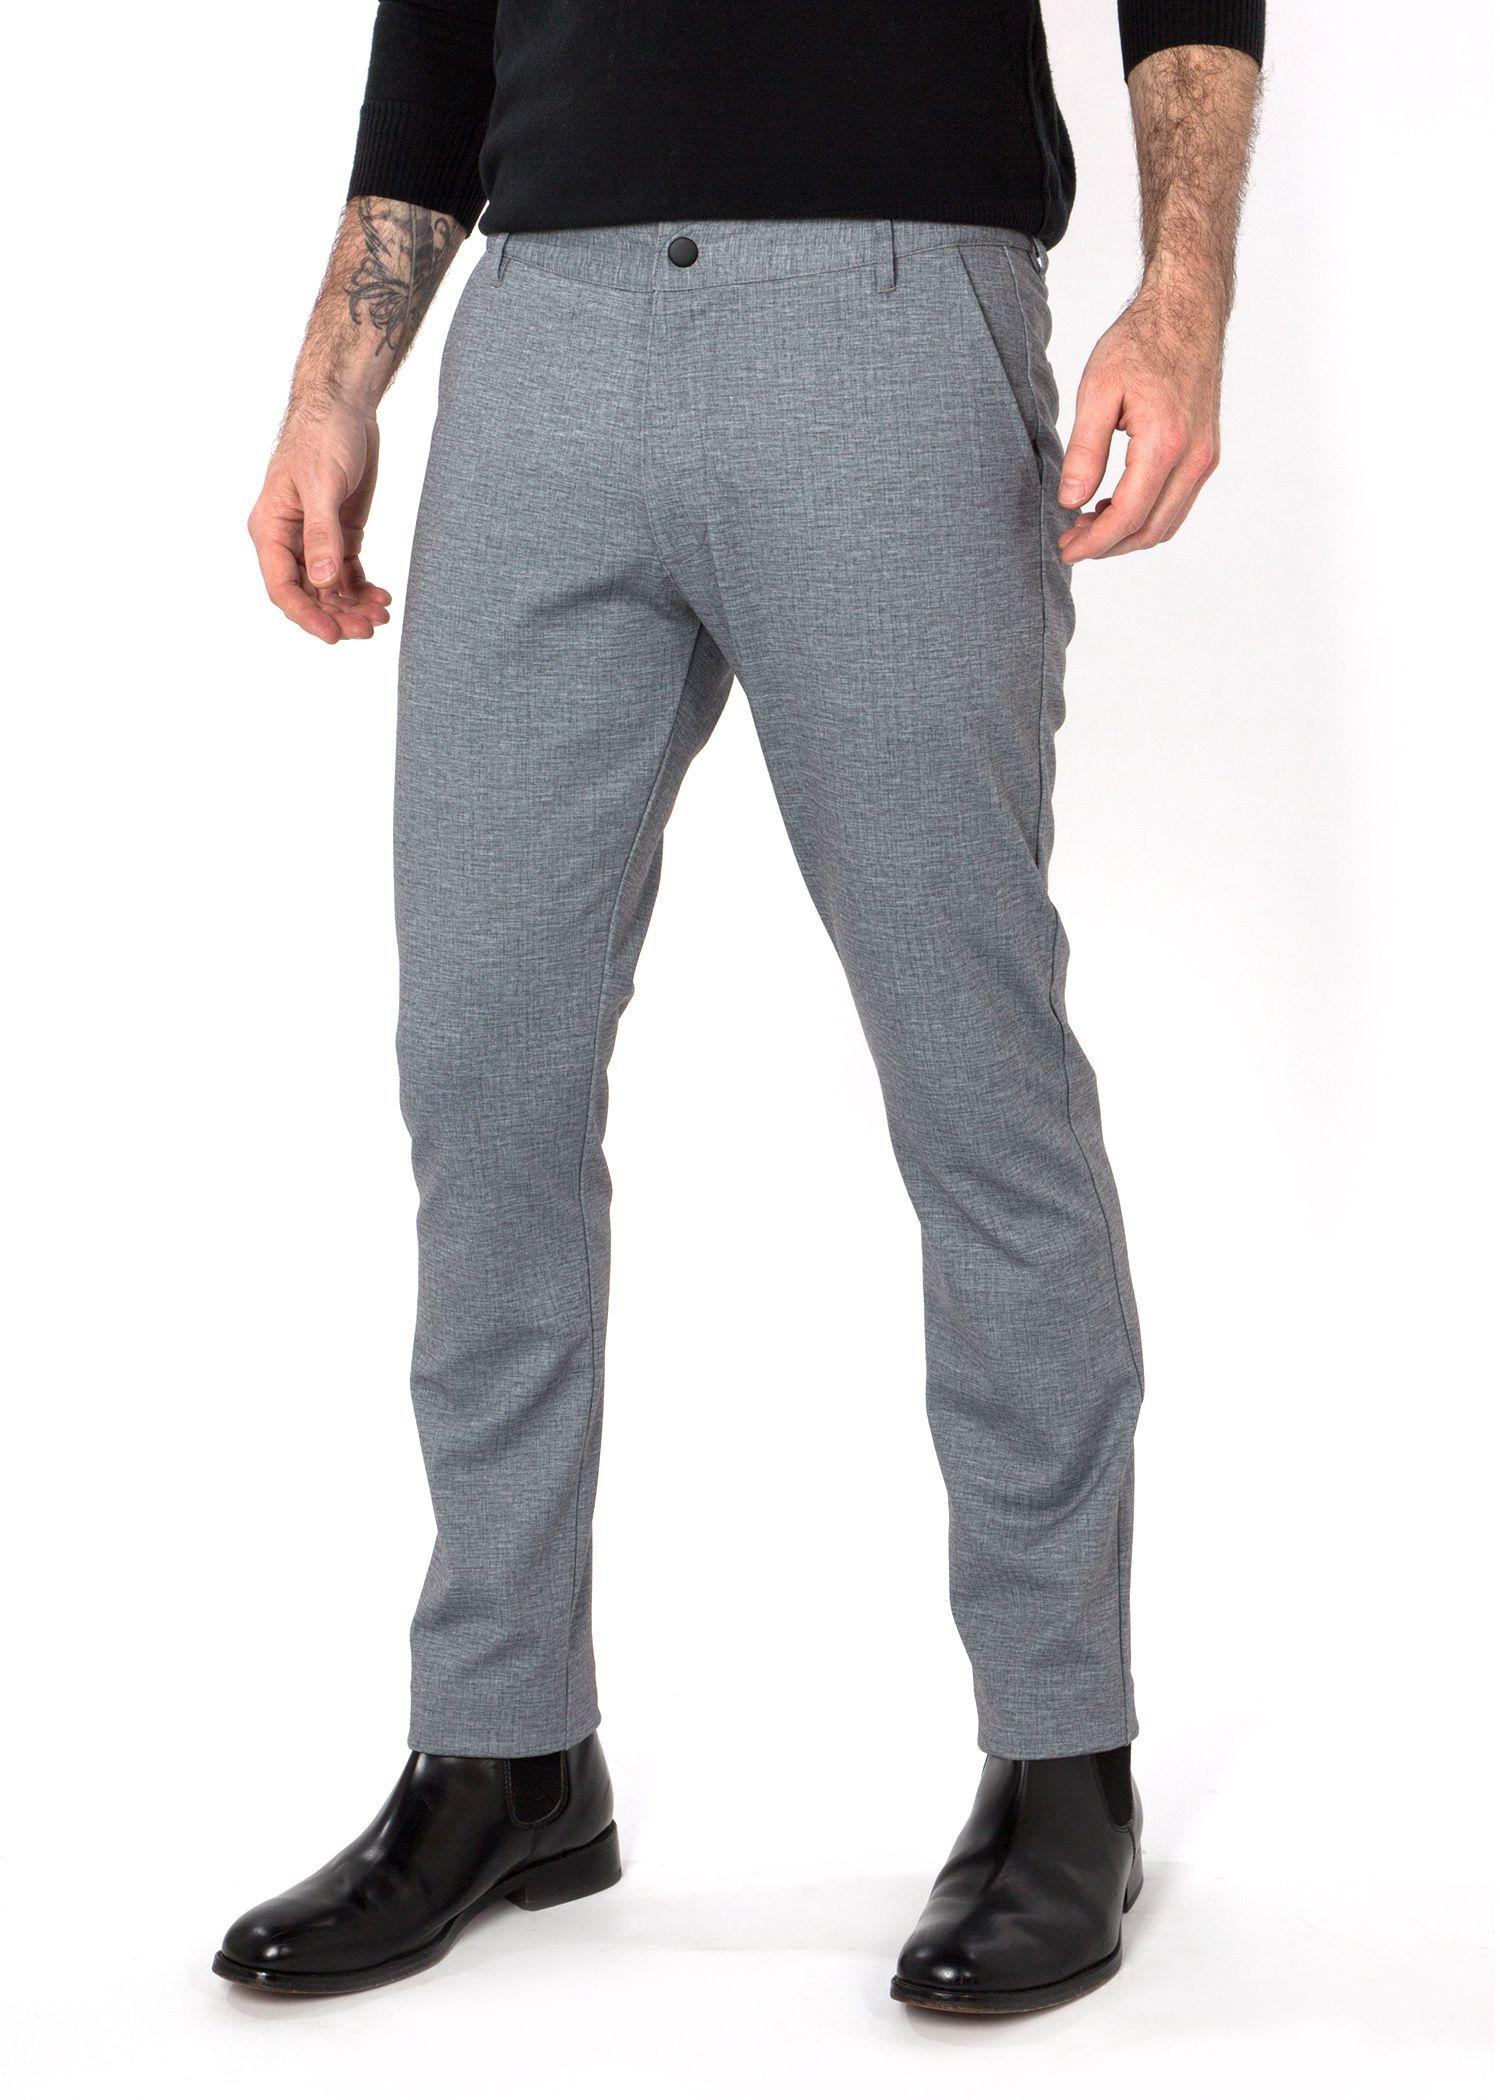 summer quality comforter high measurement men pants product casual gabardine s oriented comfortable export alcott garment asian mens branded